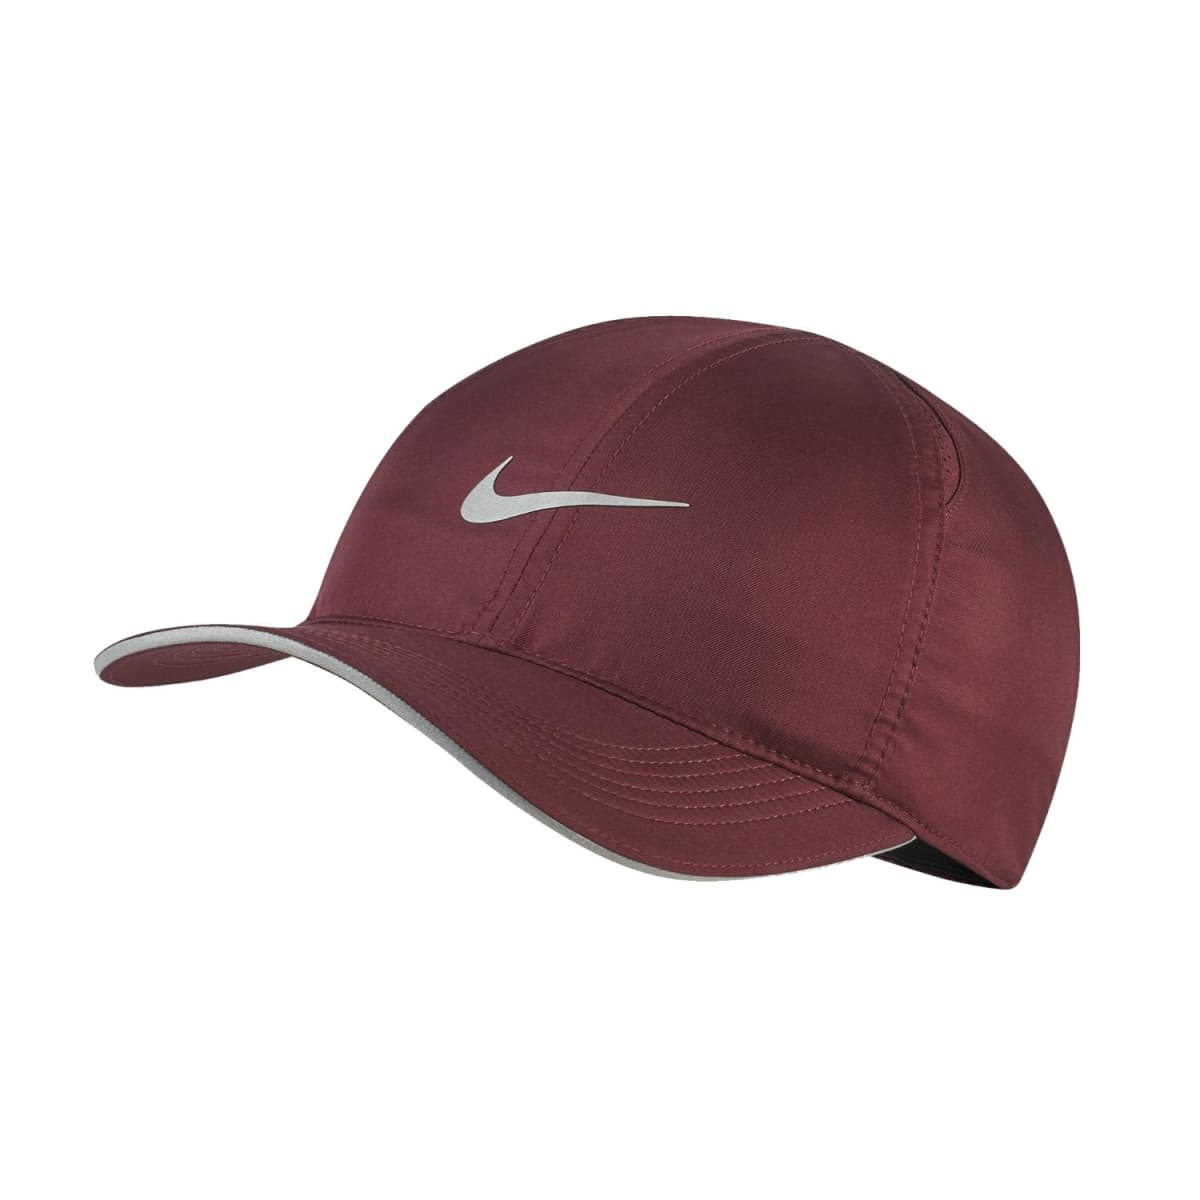 ffd08acd39b34 Nike Featherlight Run Cap